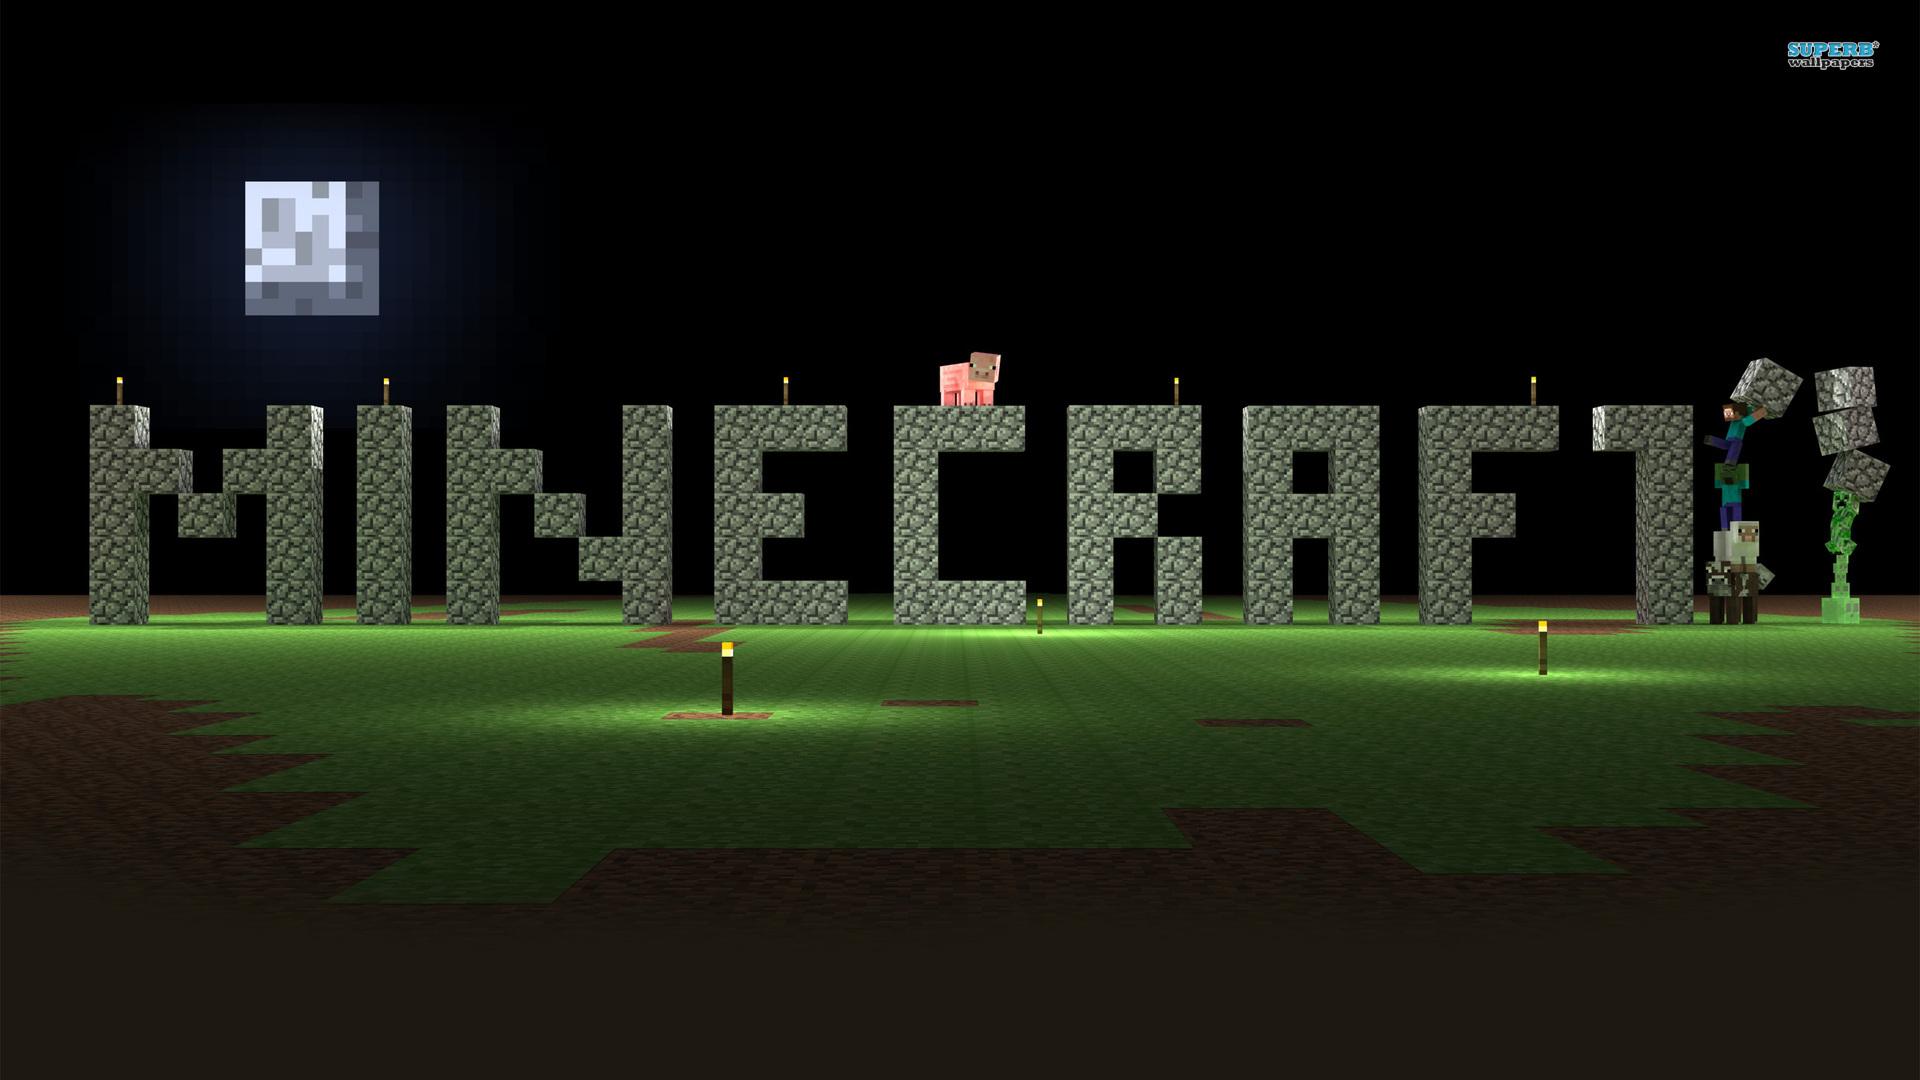 Download Minecraft Wallpaper 1920x1080 Gallery